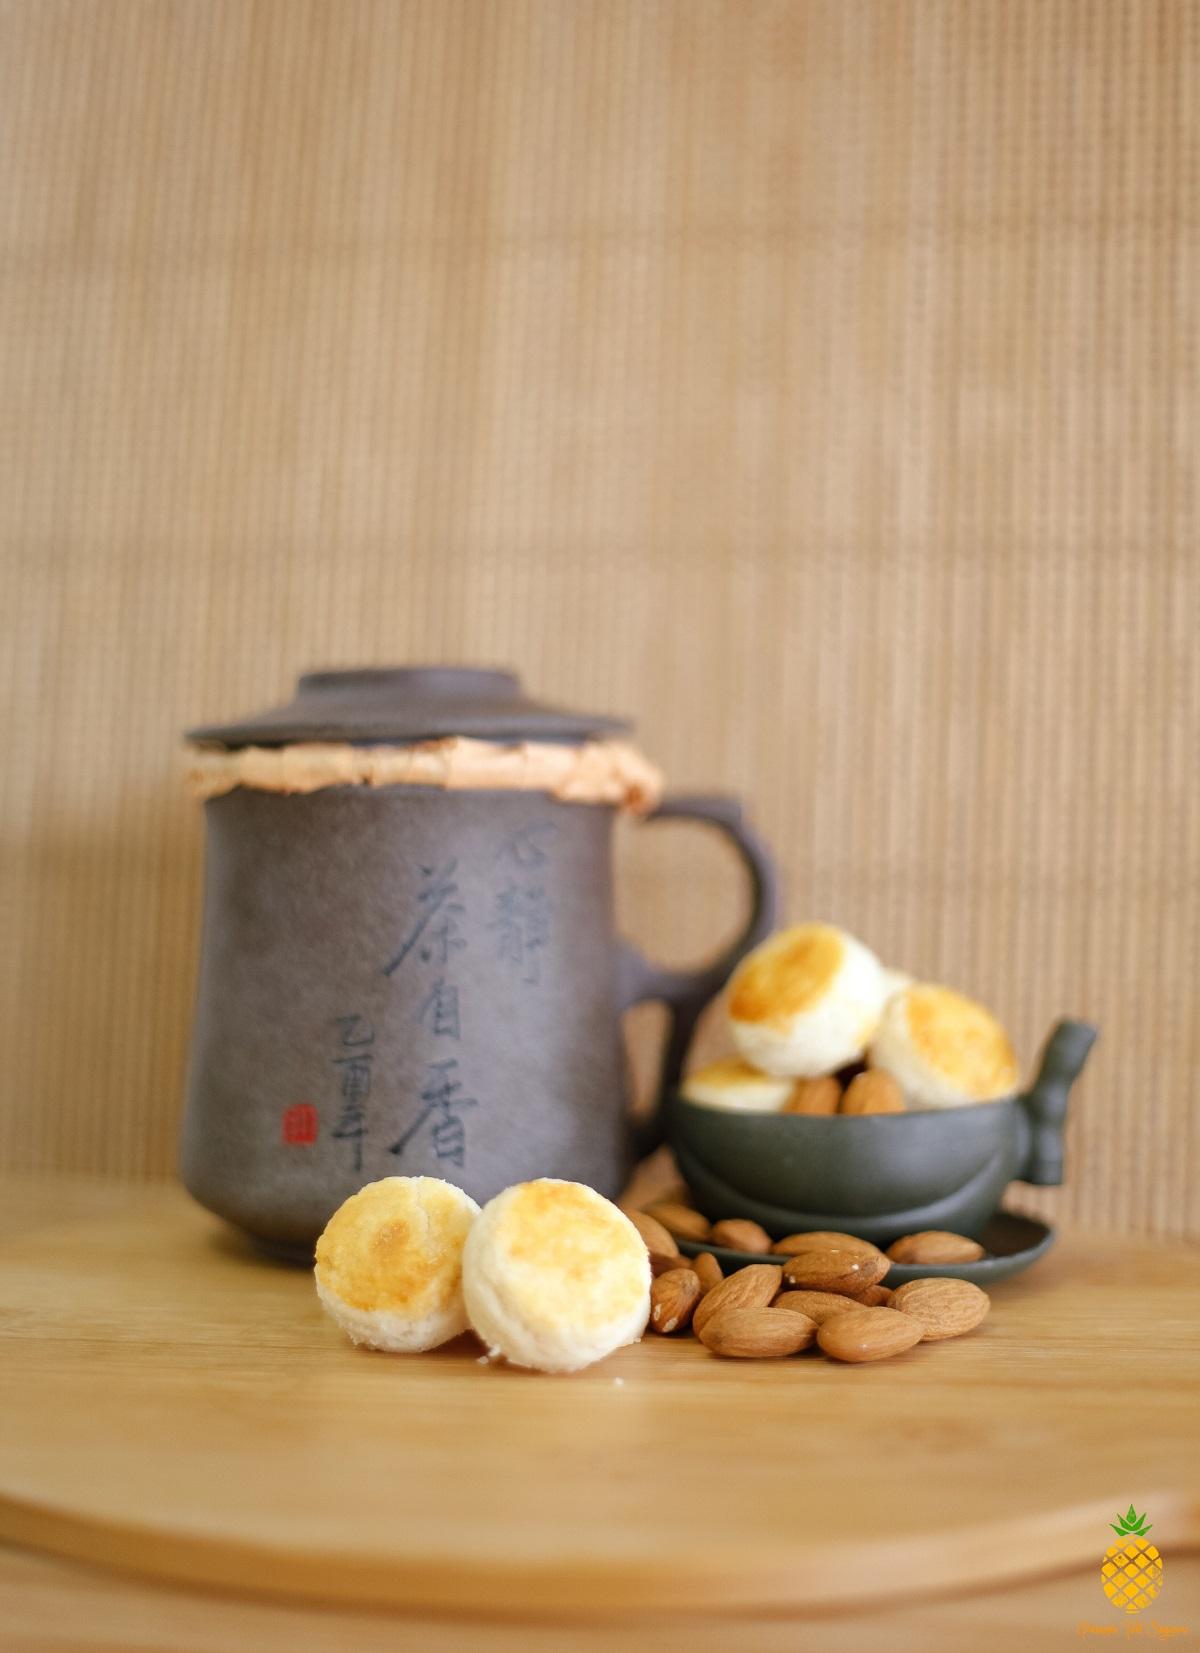 Xing Fu Almond Cookies - Pineapple Tarts Singapore